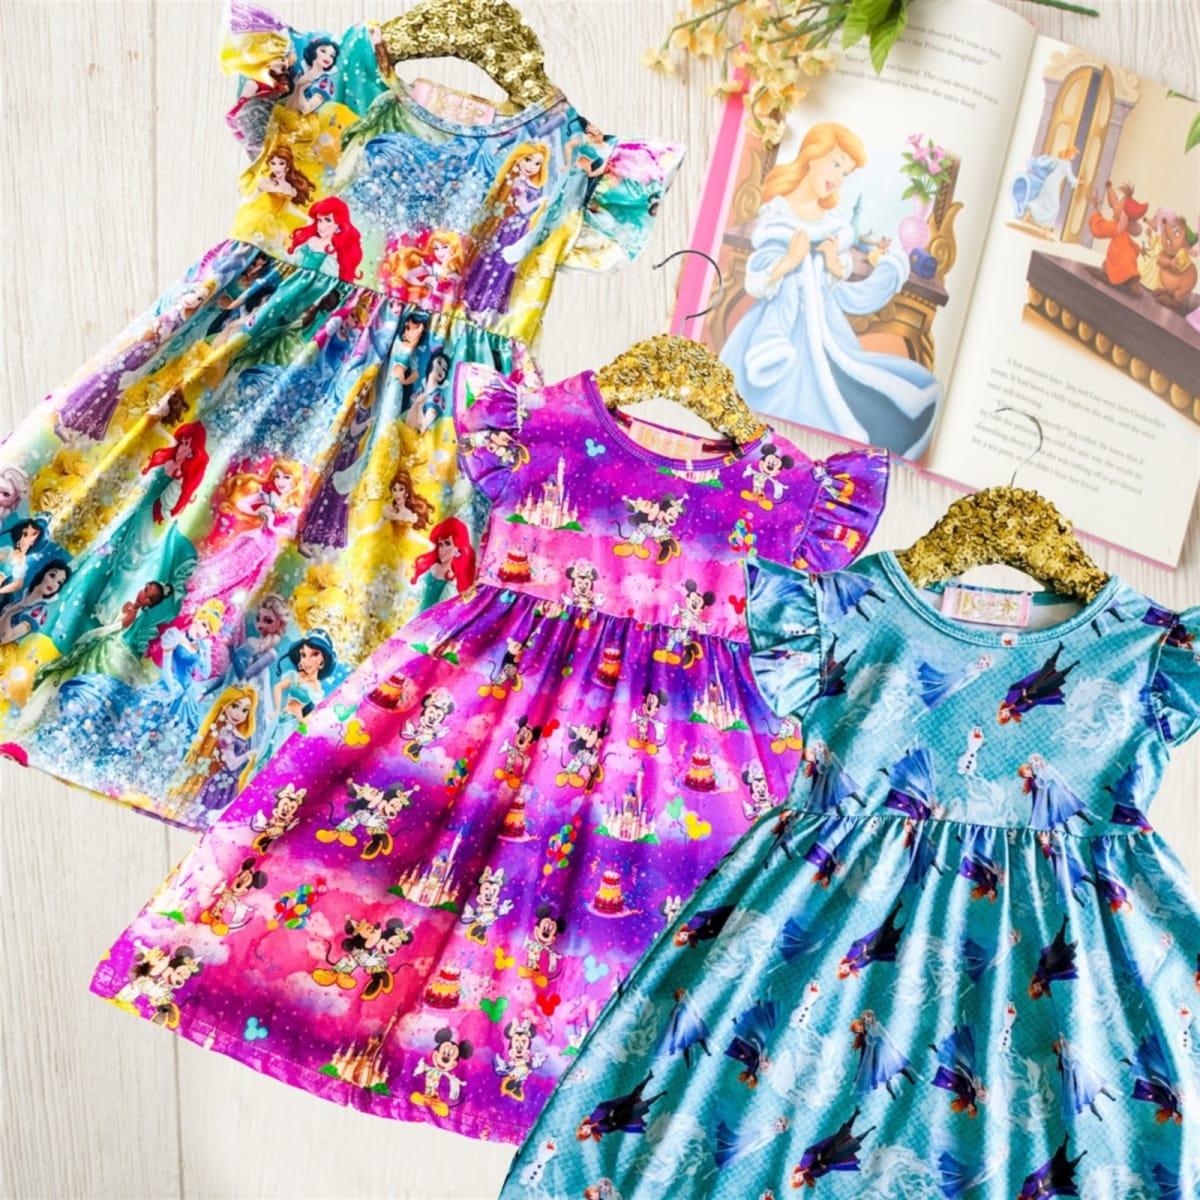 .97 Fun Theme Park Dresses + Free shipping at Jane!